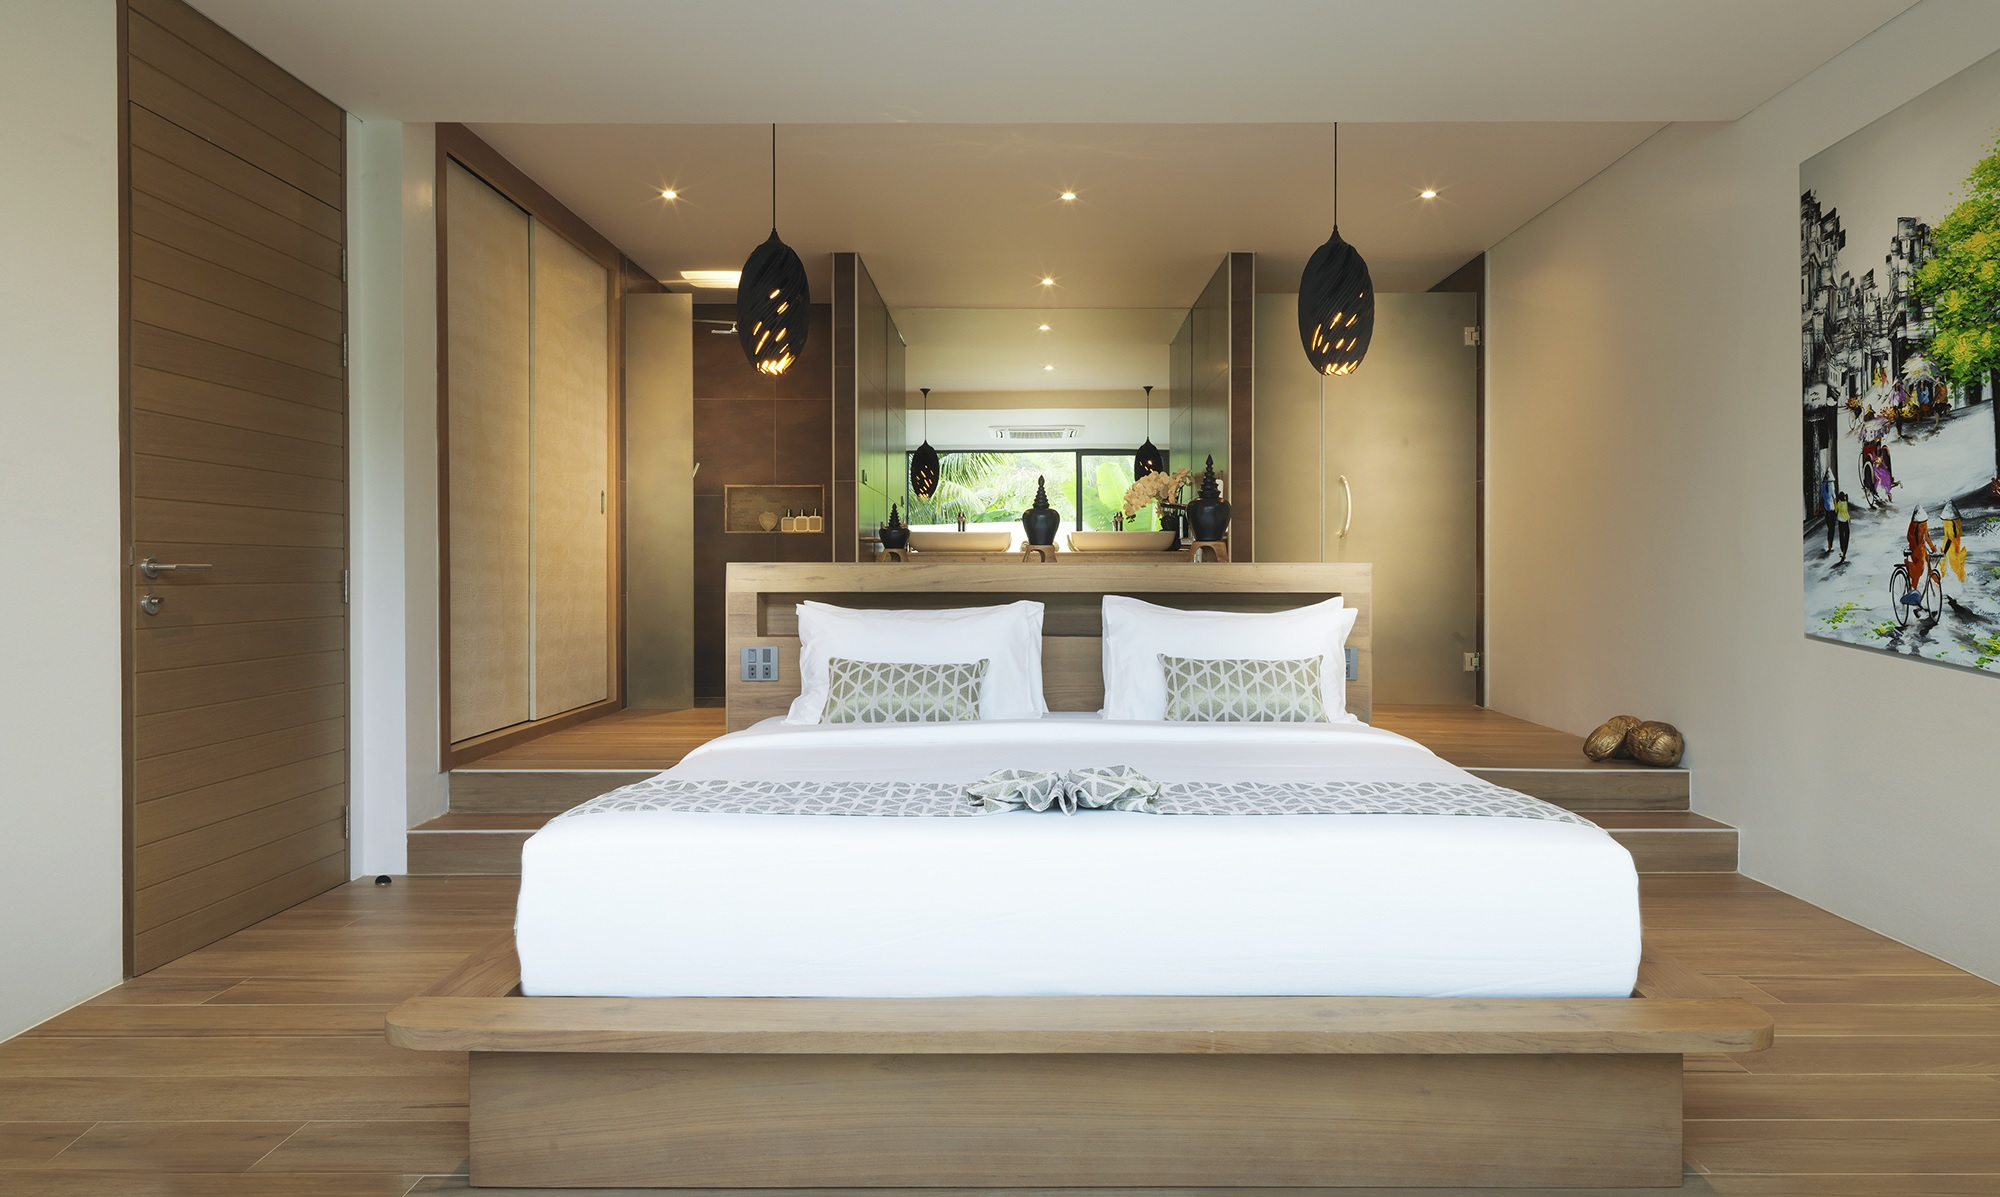 Phuket Real Estate Agency – Nai Thon Beach (6)